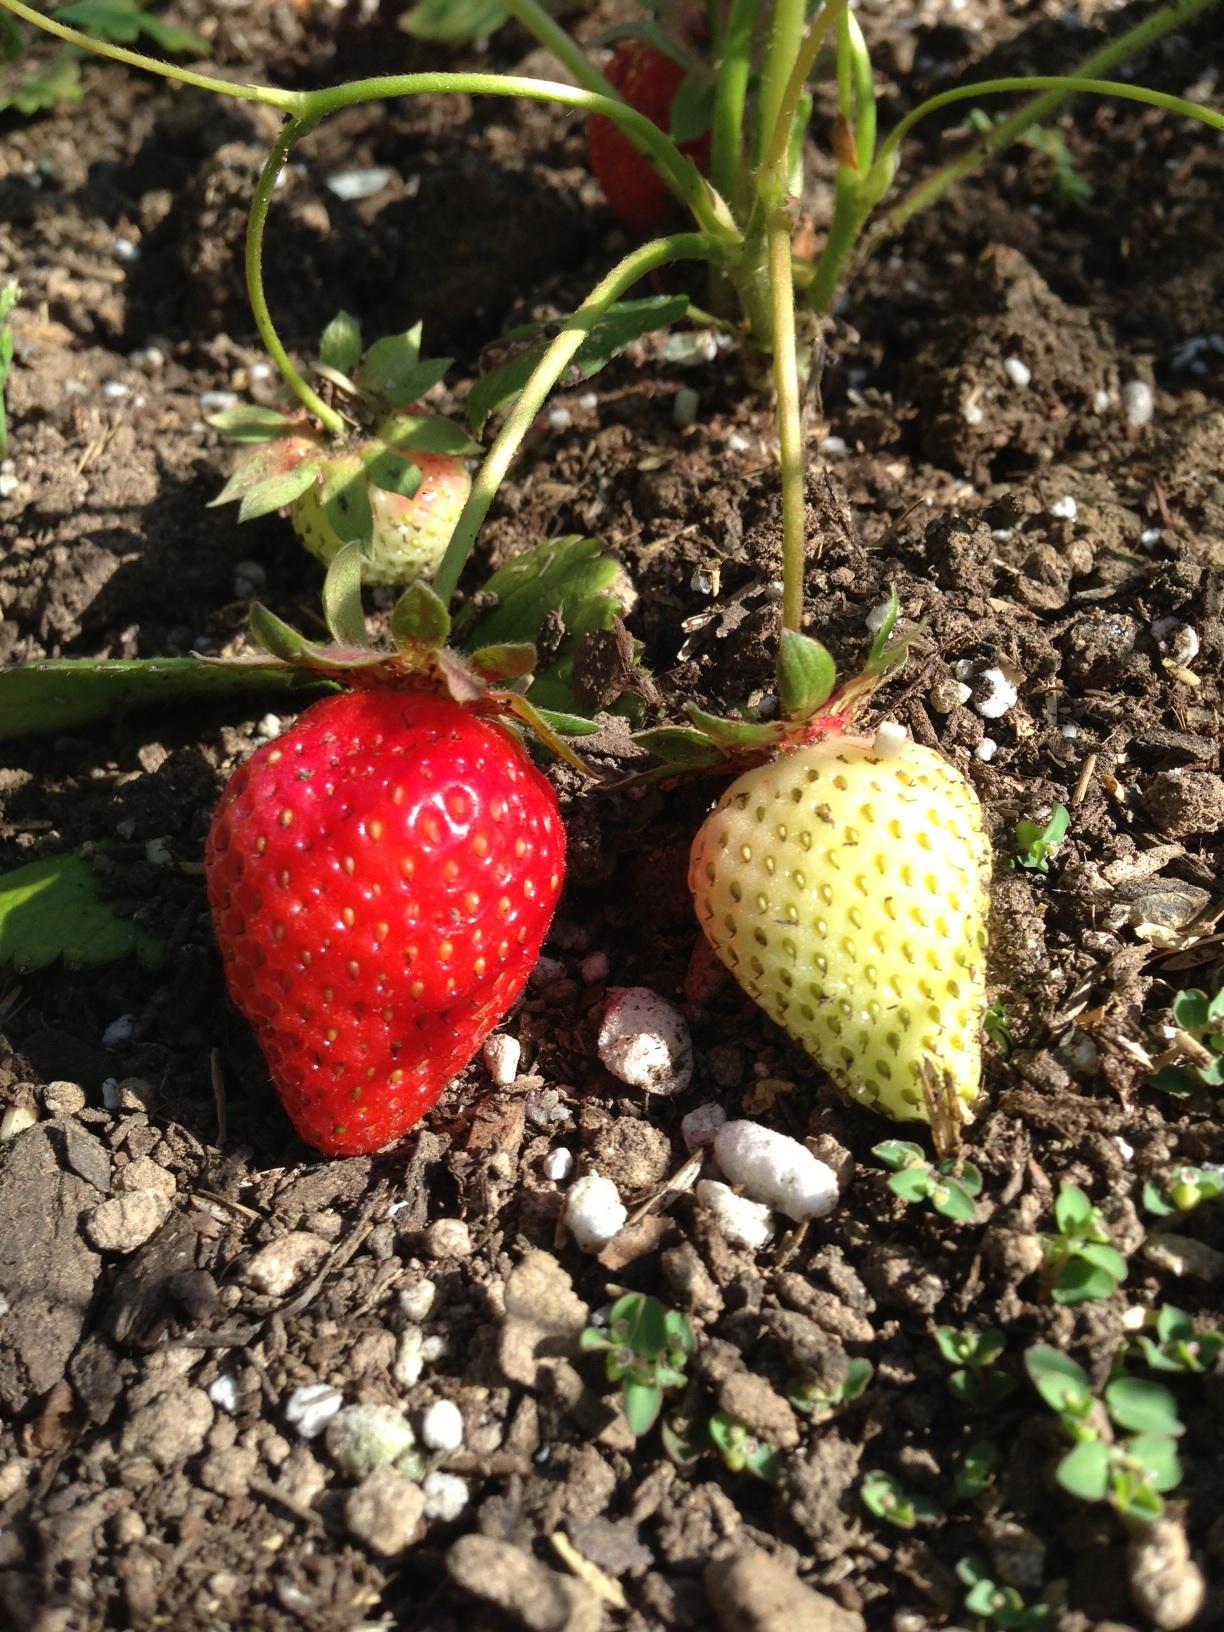 Strawberries in the garden at my work